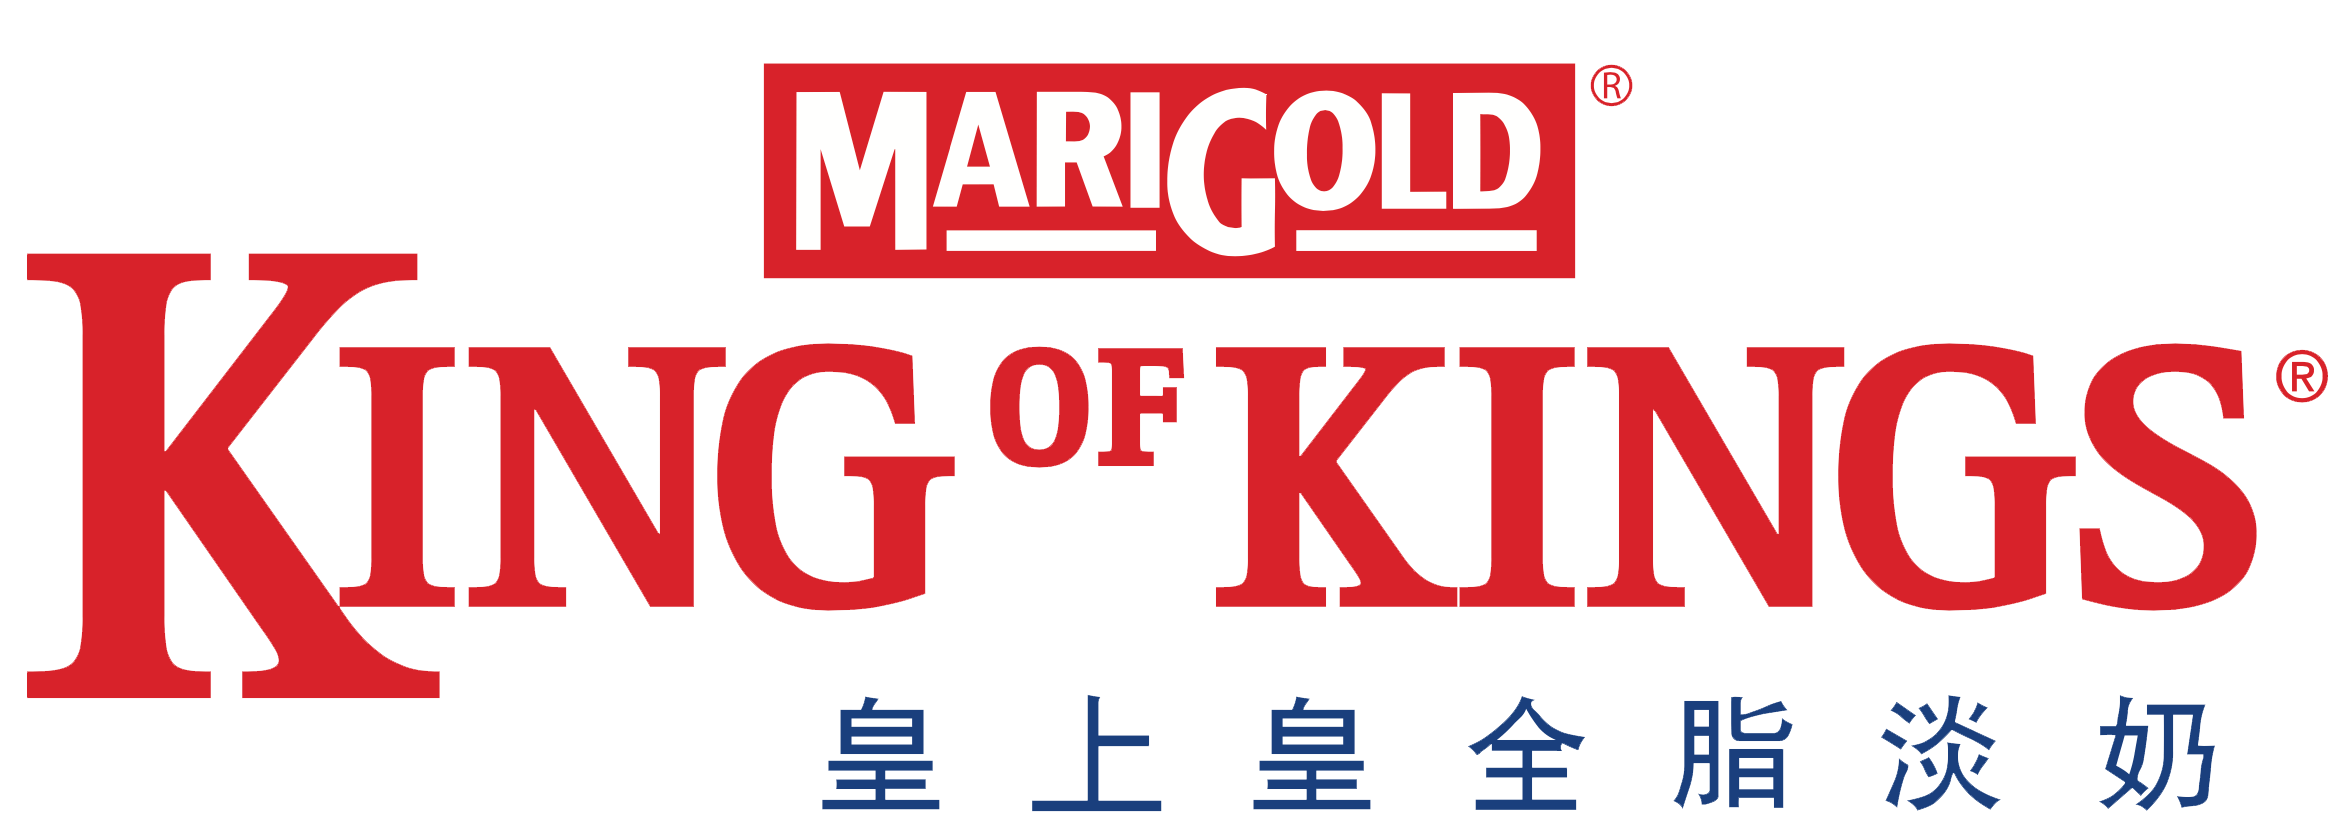 Marigold King of Kings